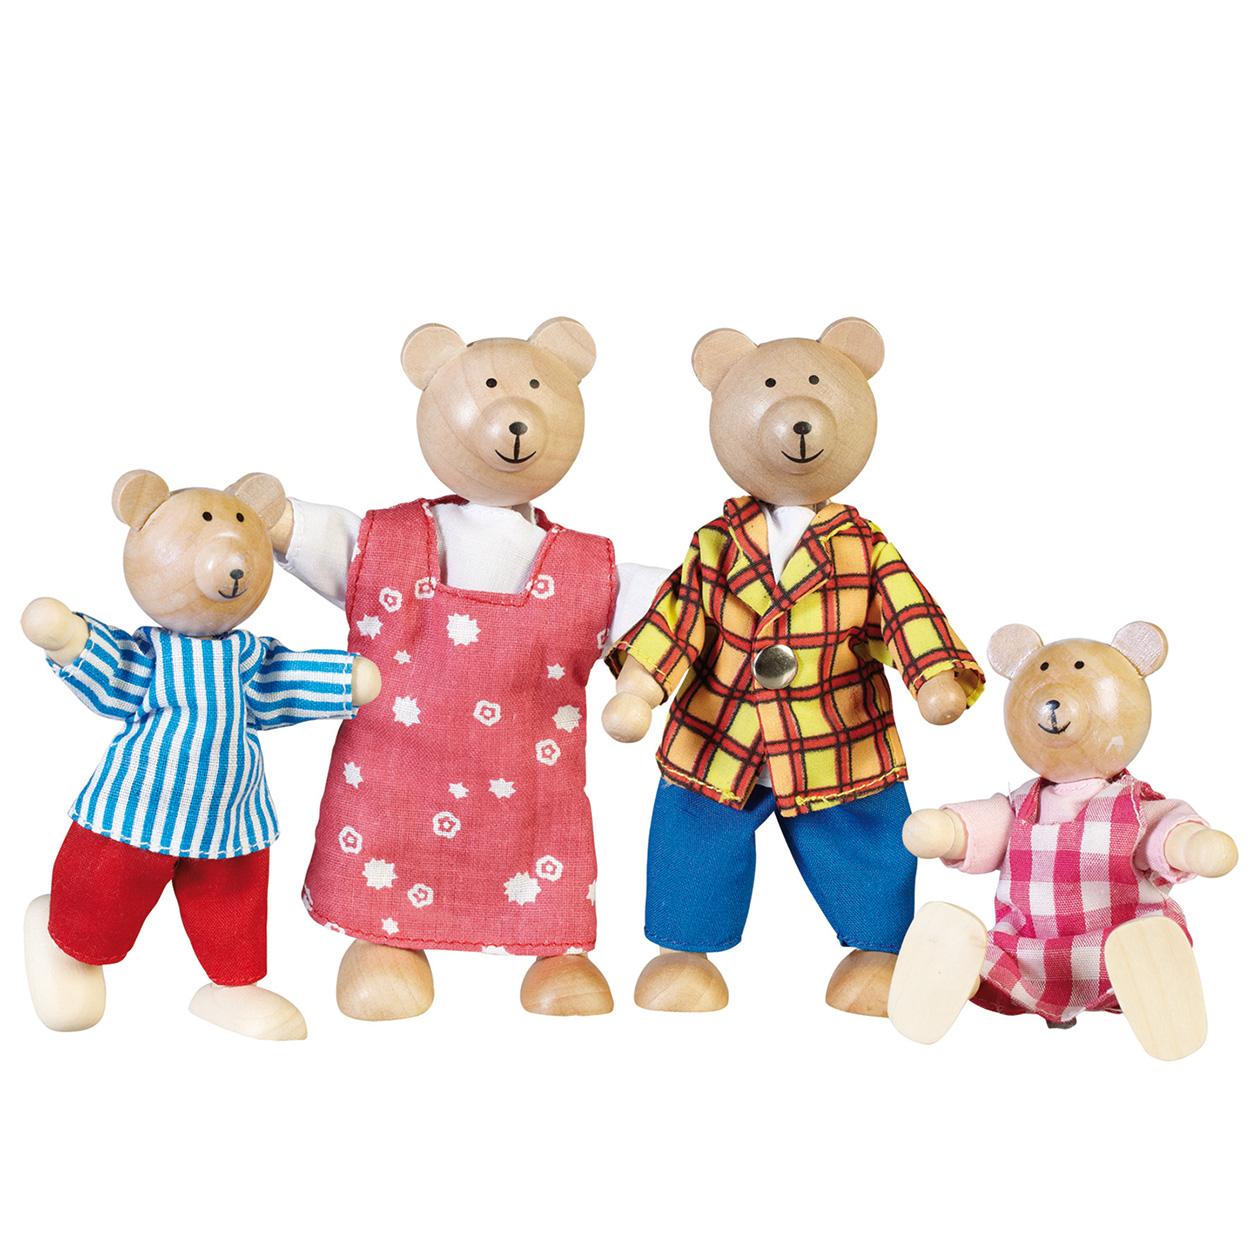 De beren poppenhuis familie online kopen for Poppenhuis poppetjes